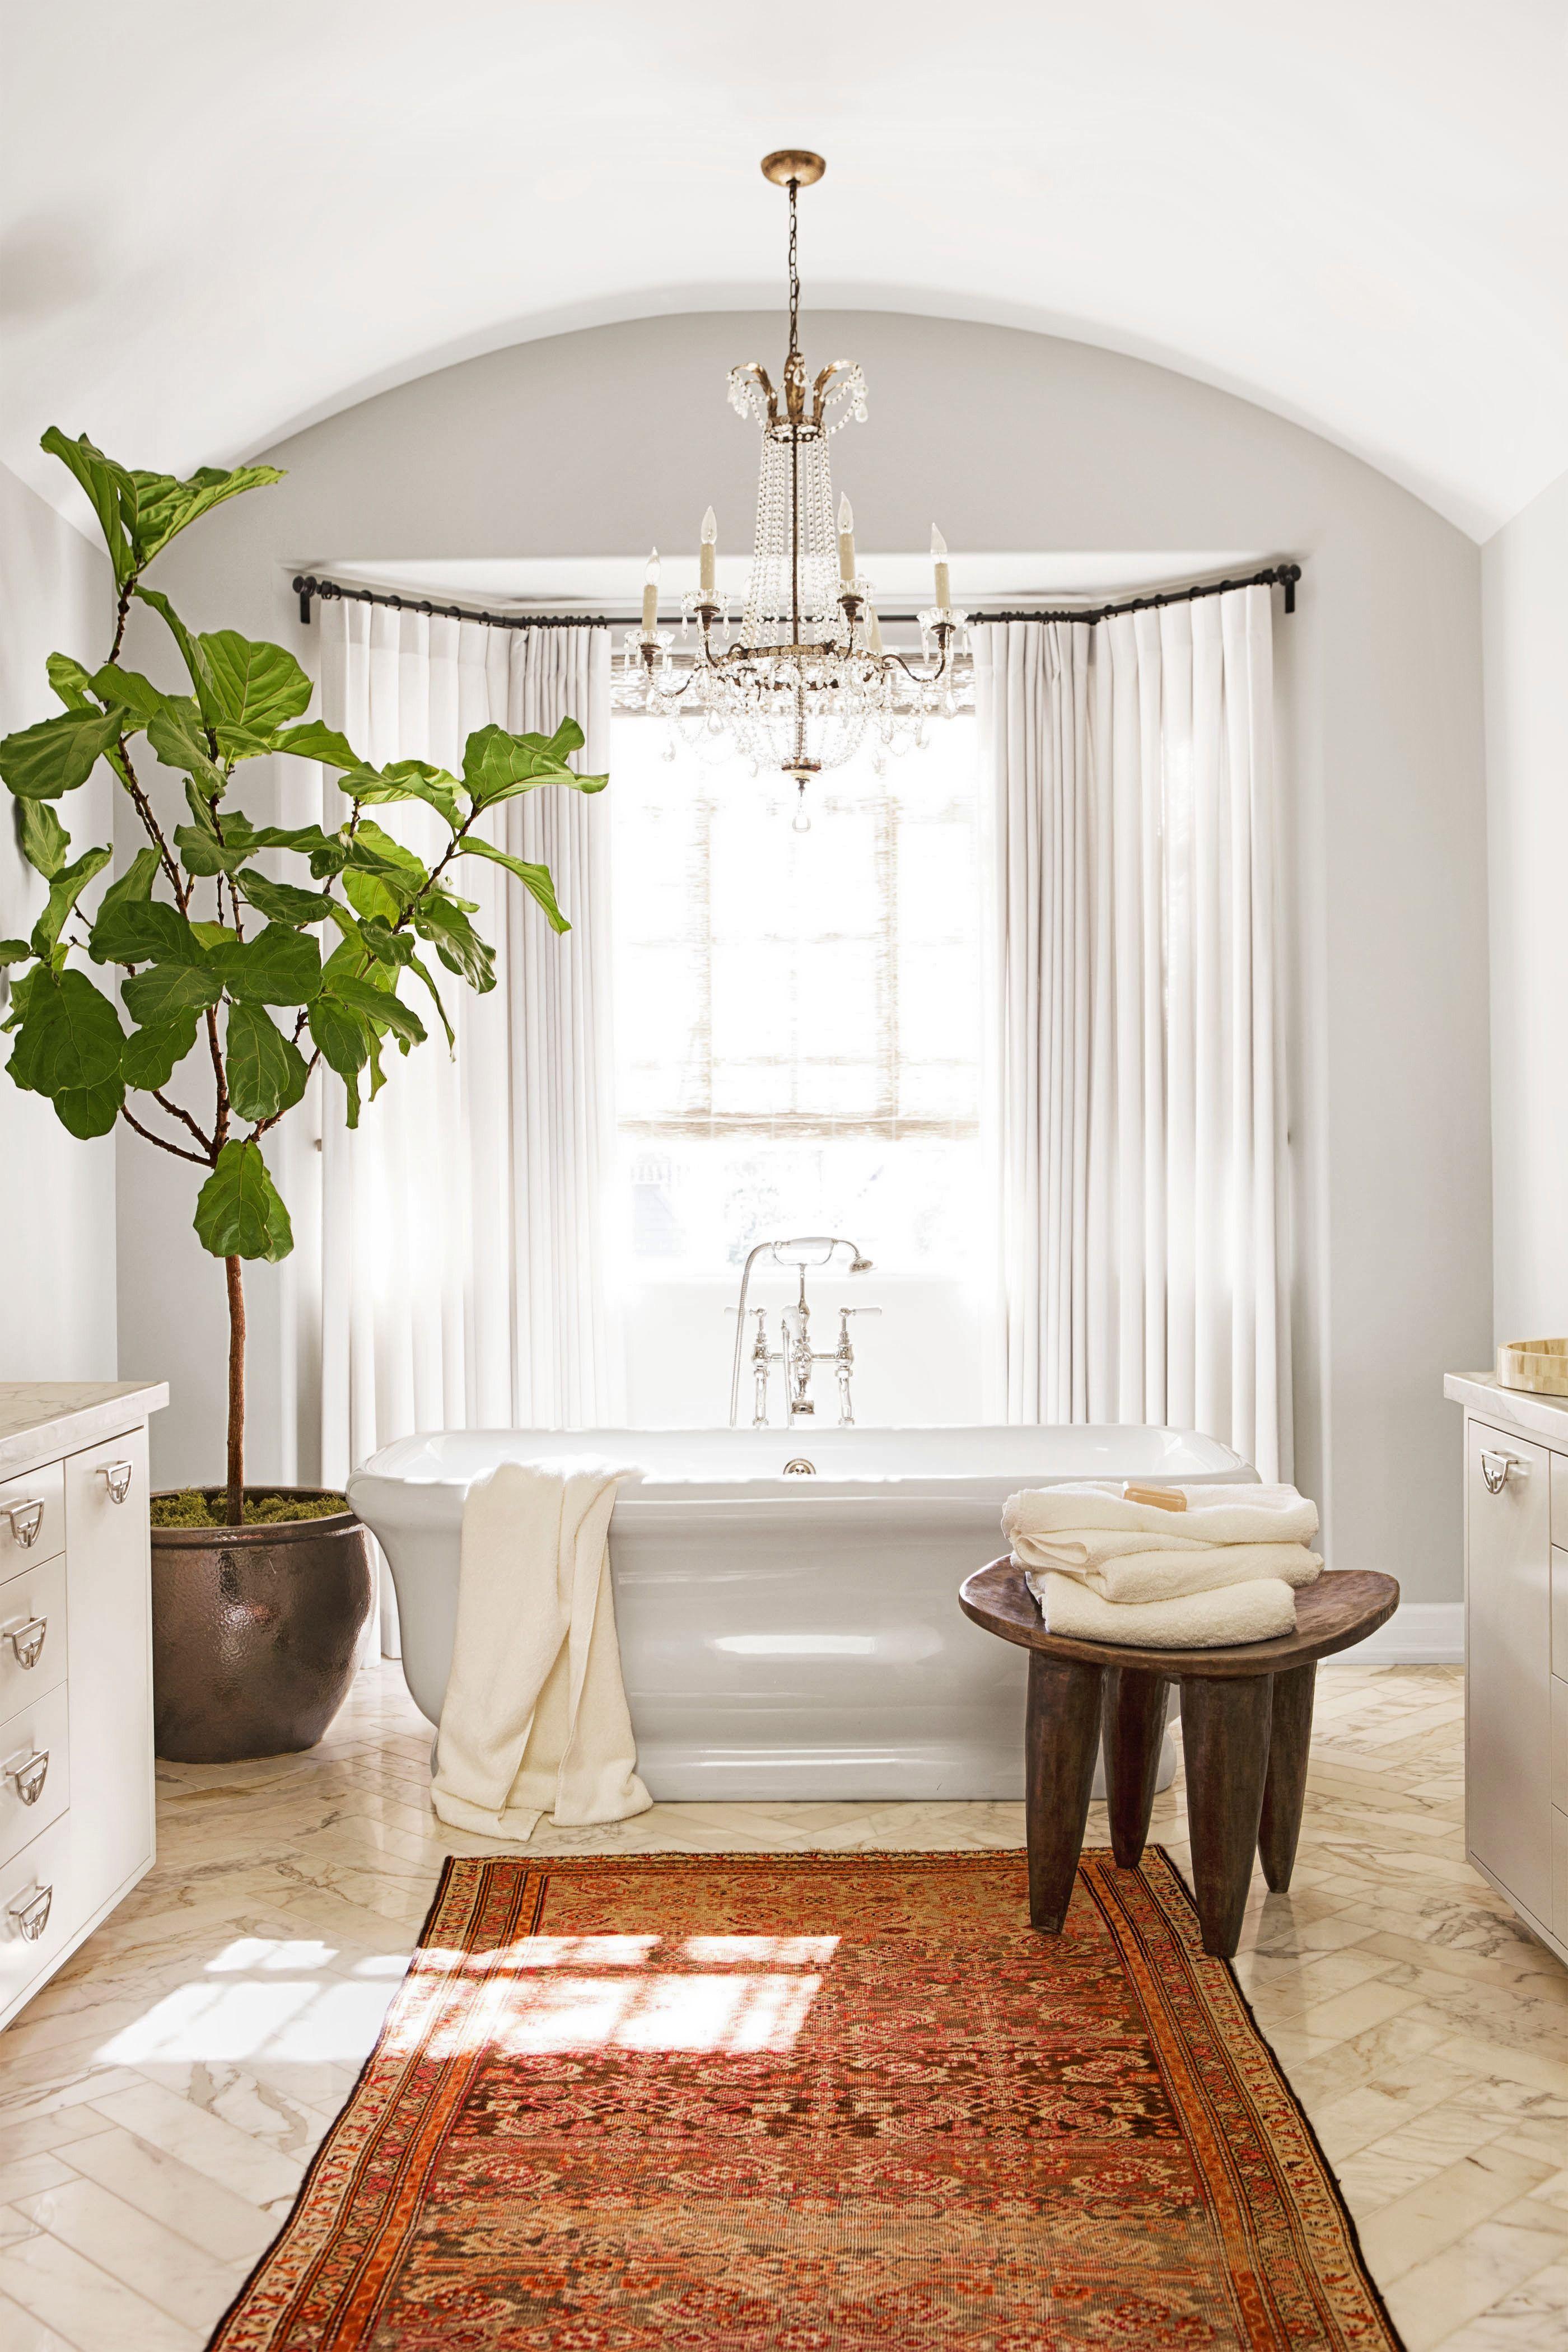 50 Bathroom Decorating Ideas Pictures Of Bathroom Decor